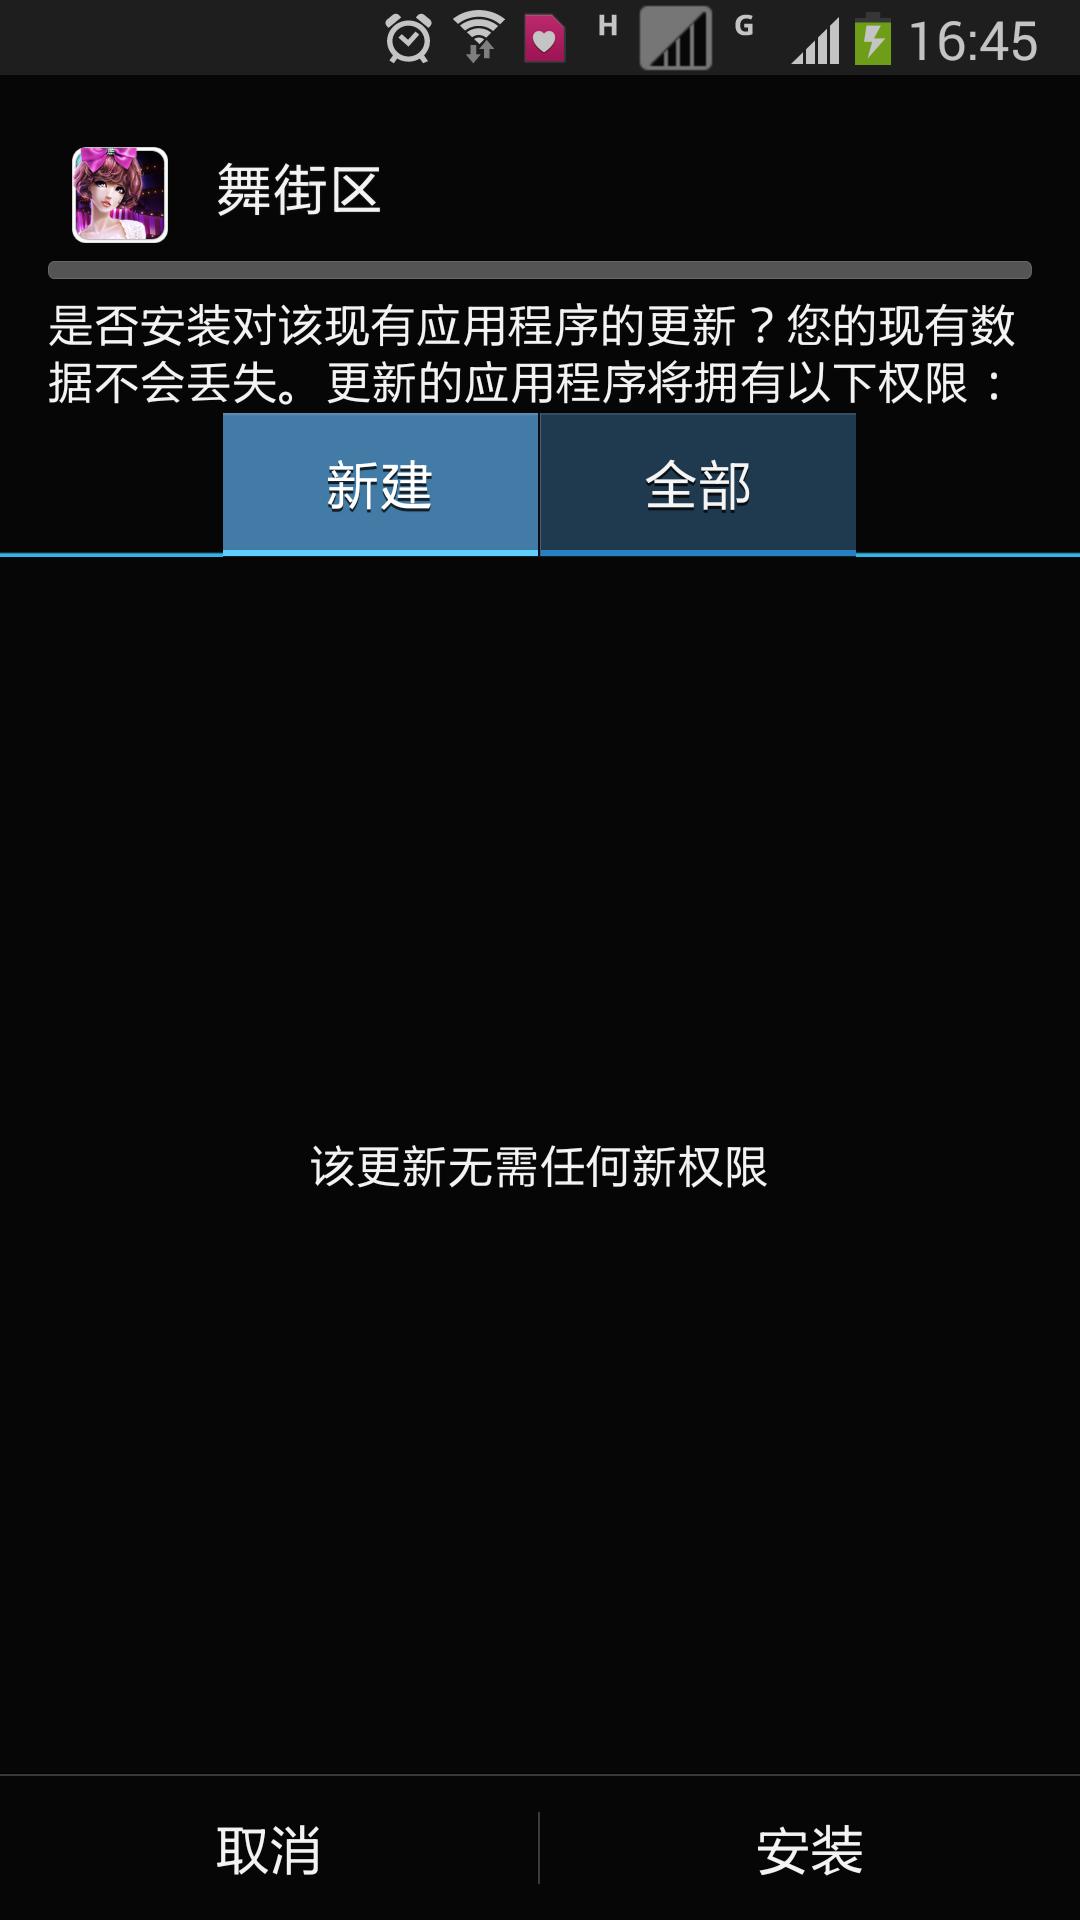 Screenshot_2015-09-23-16-45-16.png